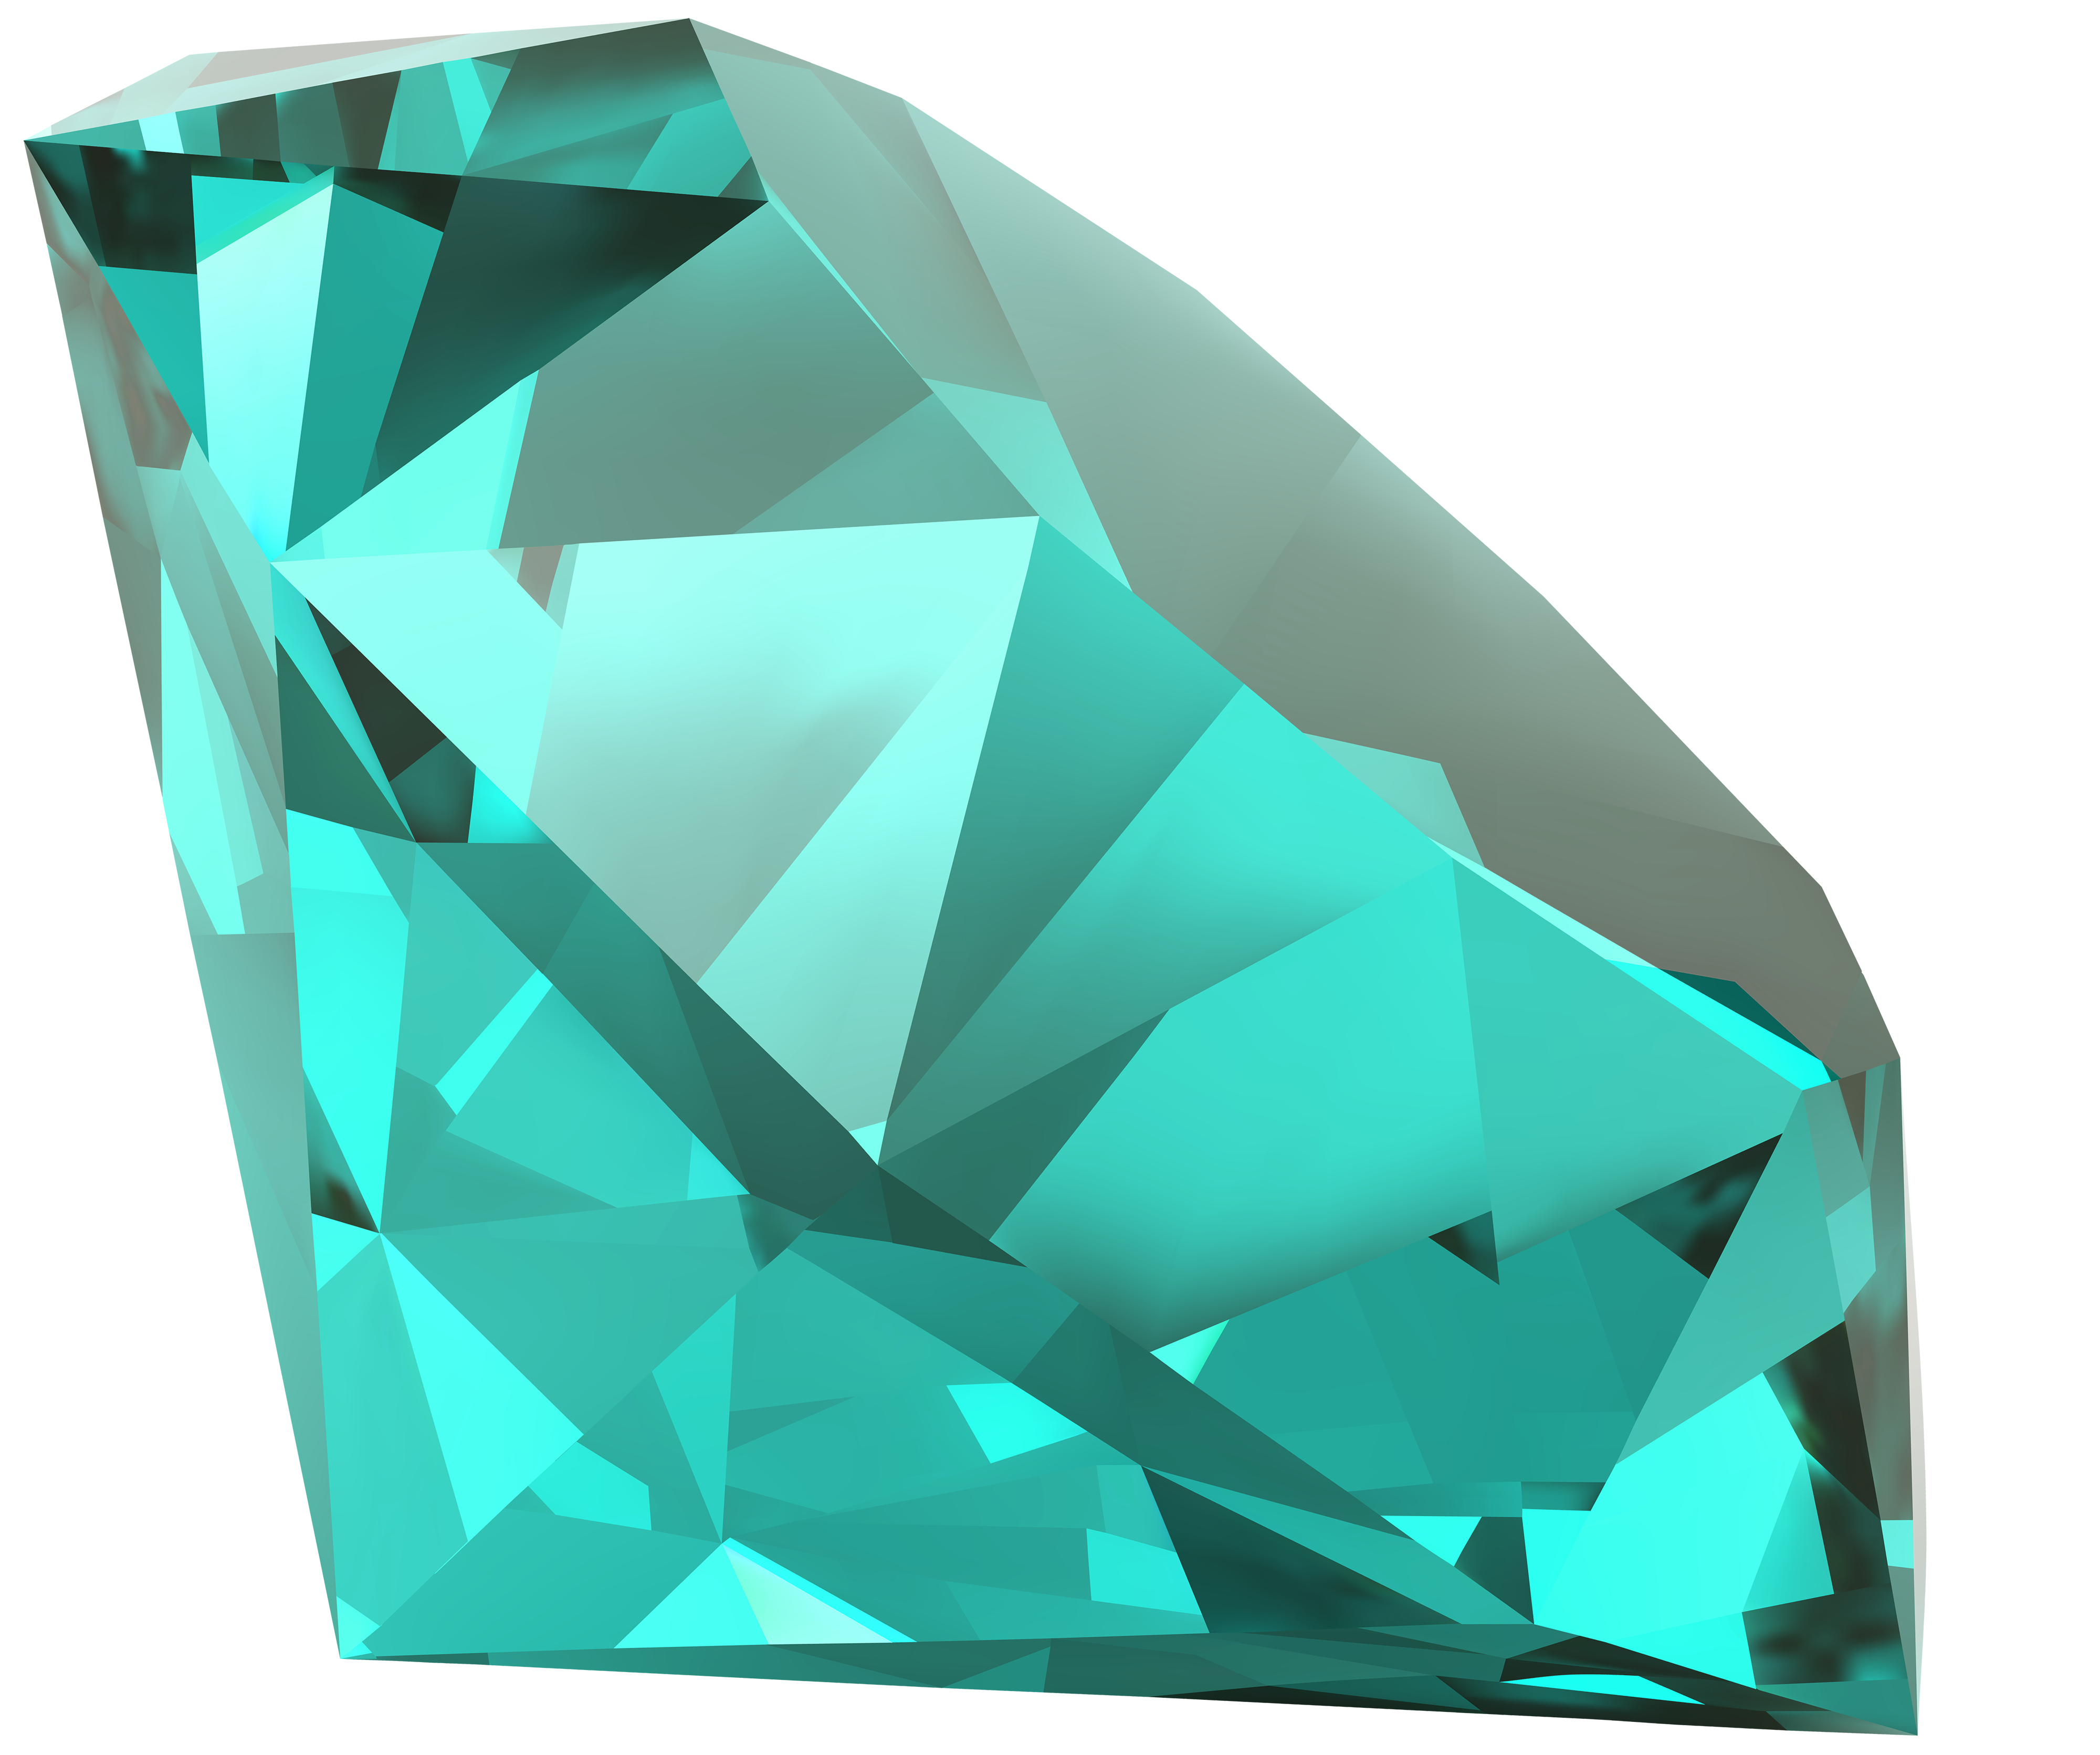 Diamond clip art free clipart images 4 2